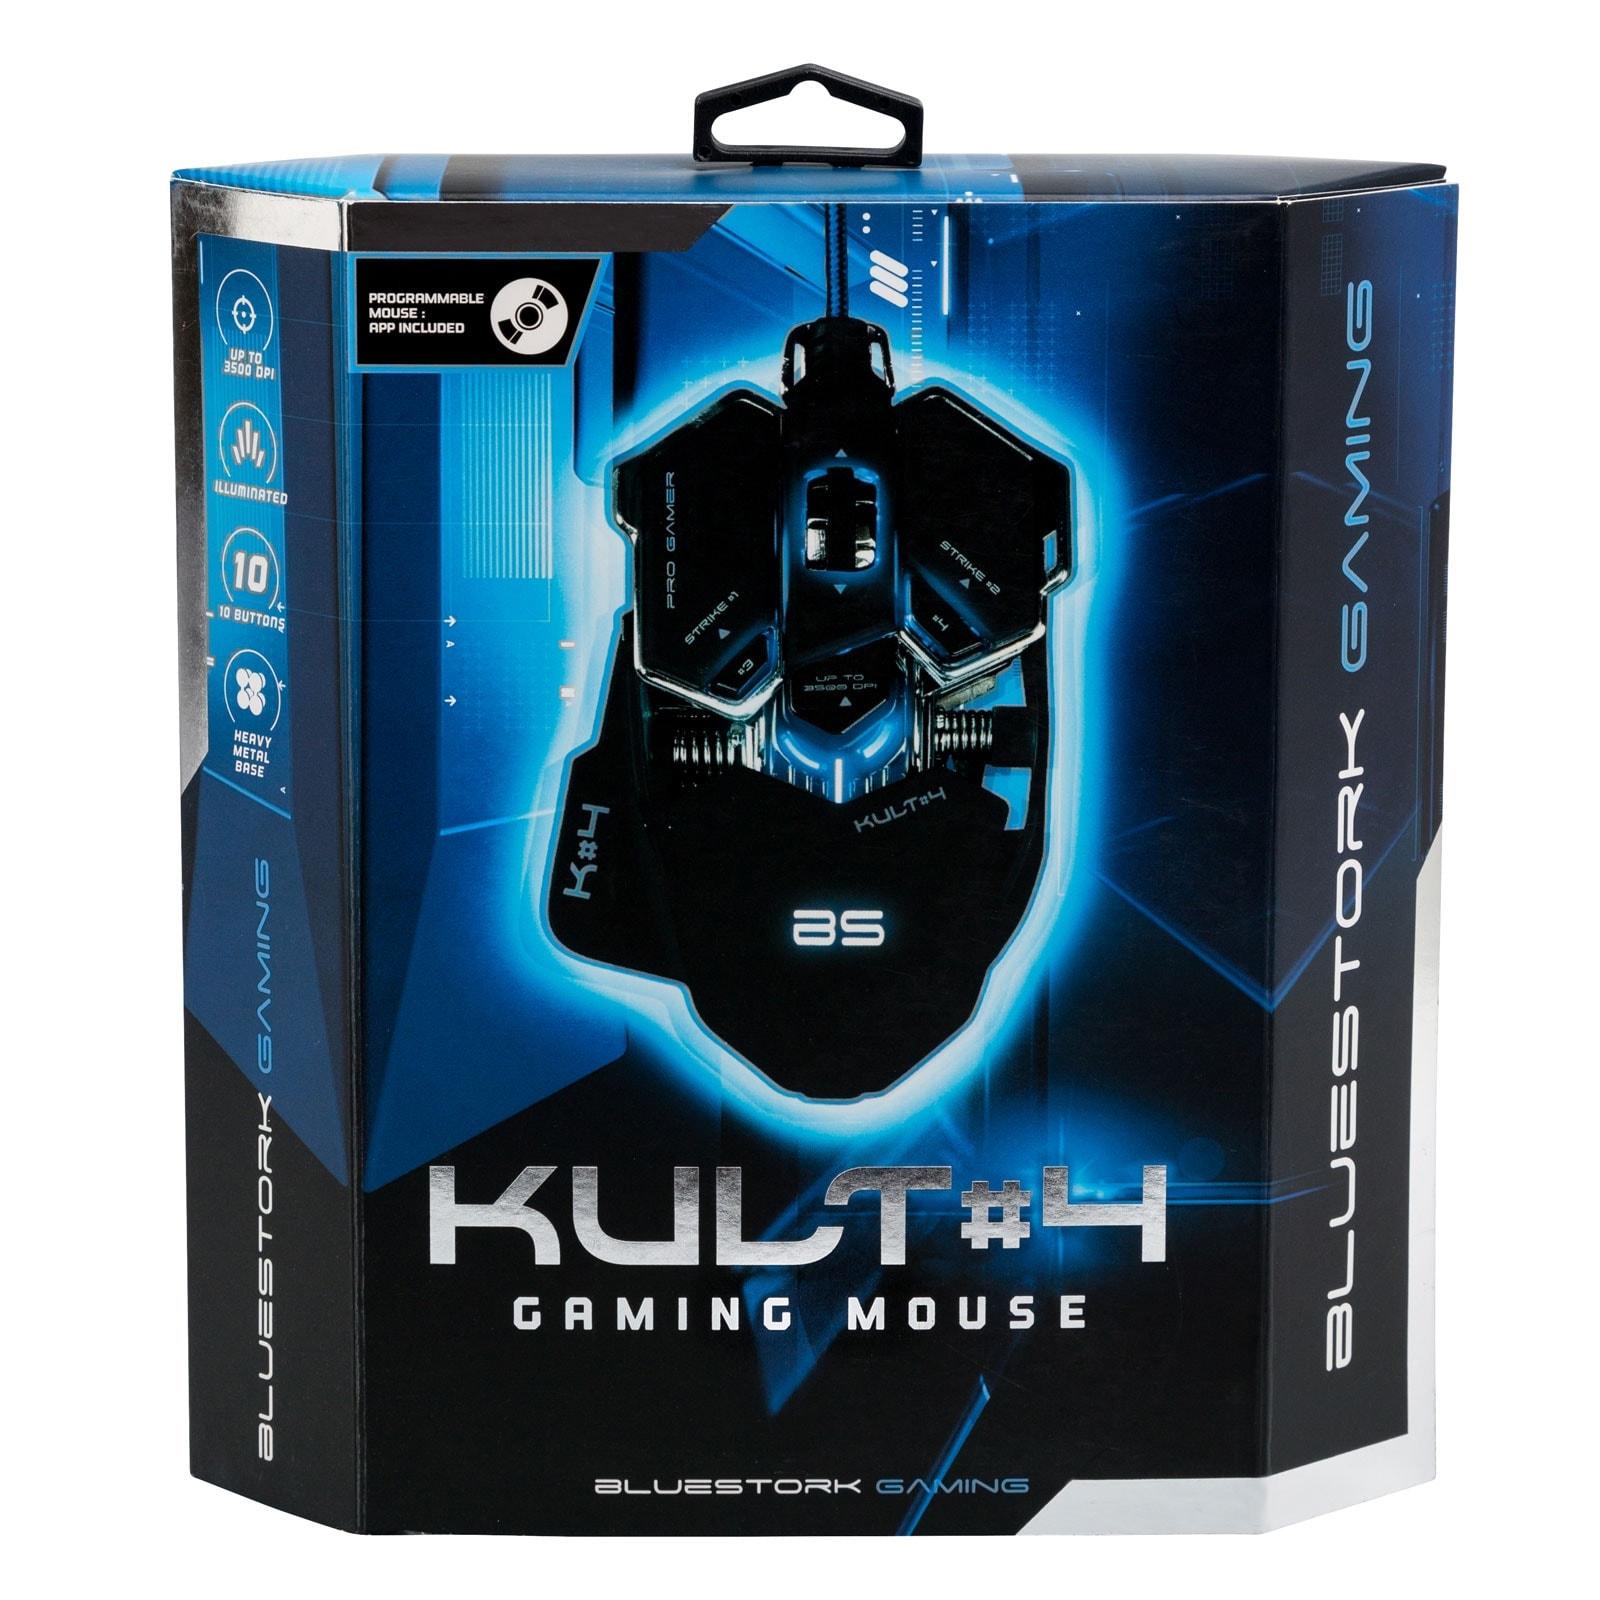 Bluestork KULT 4 BLACK ED. (BS-GM-KULT4) - Achat / Vente Souris PC sur Cybertek.fr - 4